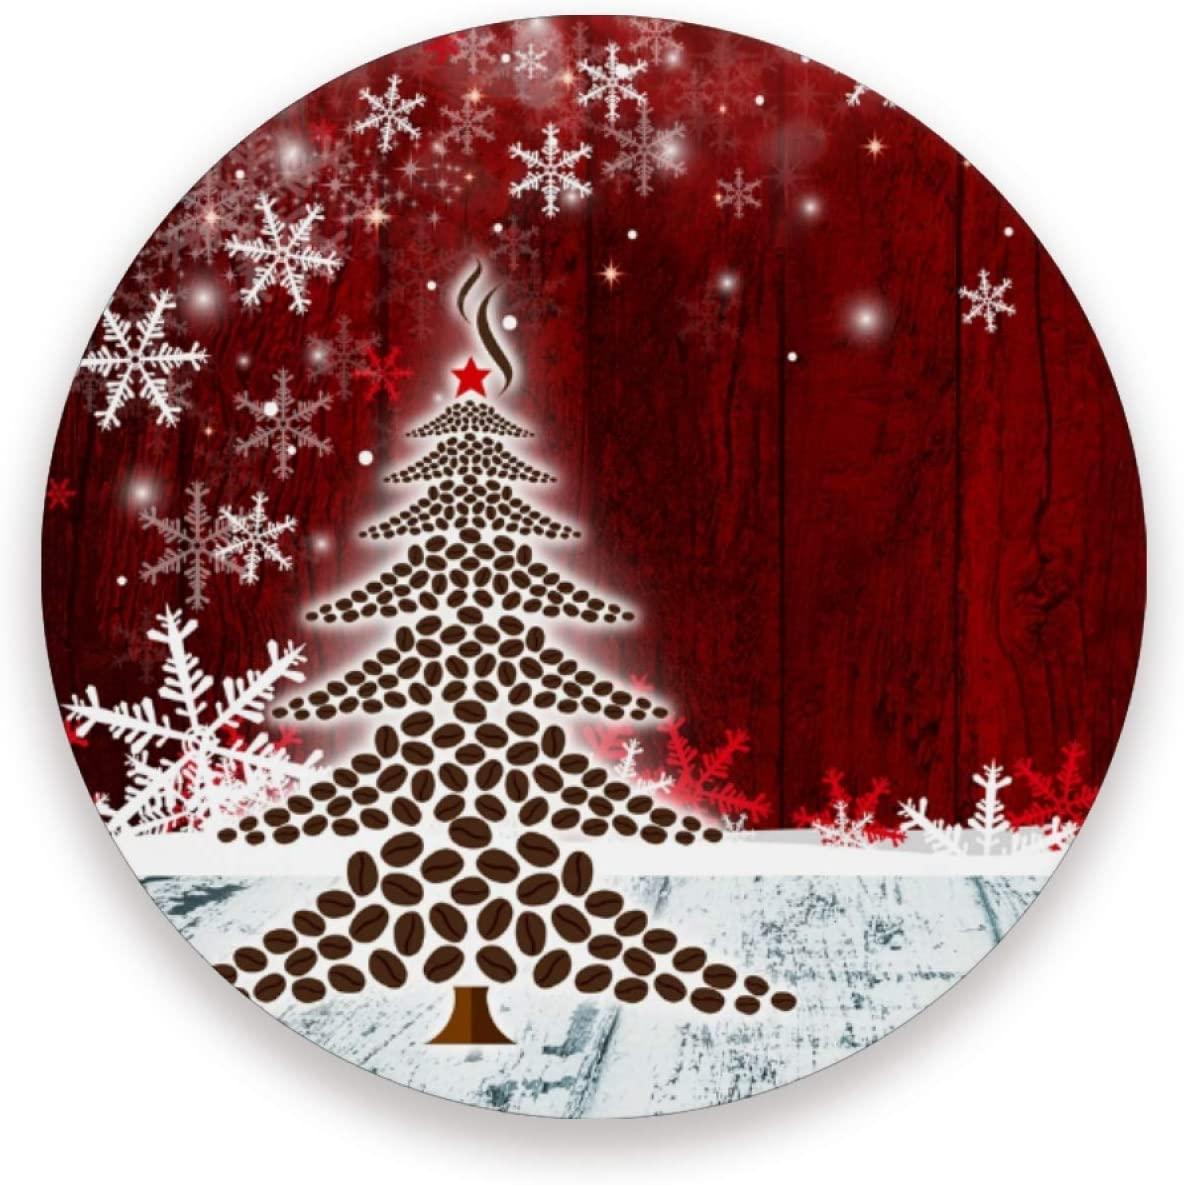 JUMBEAR Christmas Tree Snowflake Ceramic Coasters for Drinks, Set of 2 Absorbent Round Stone Coasters with Cork Base